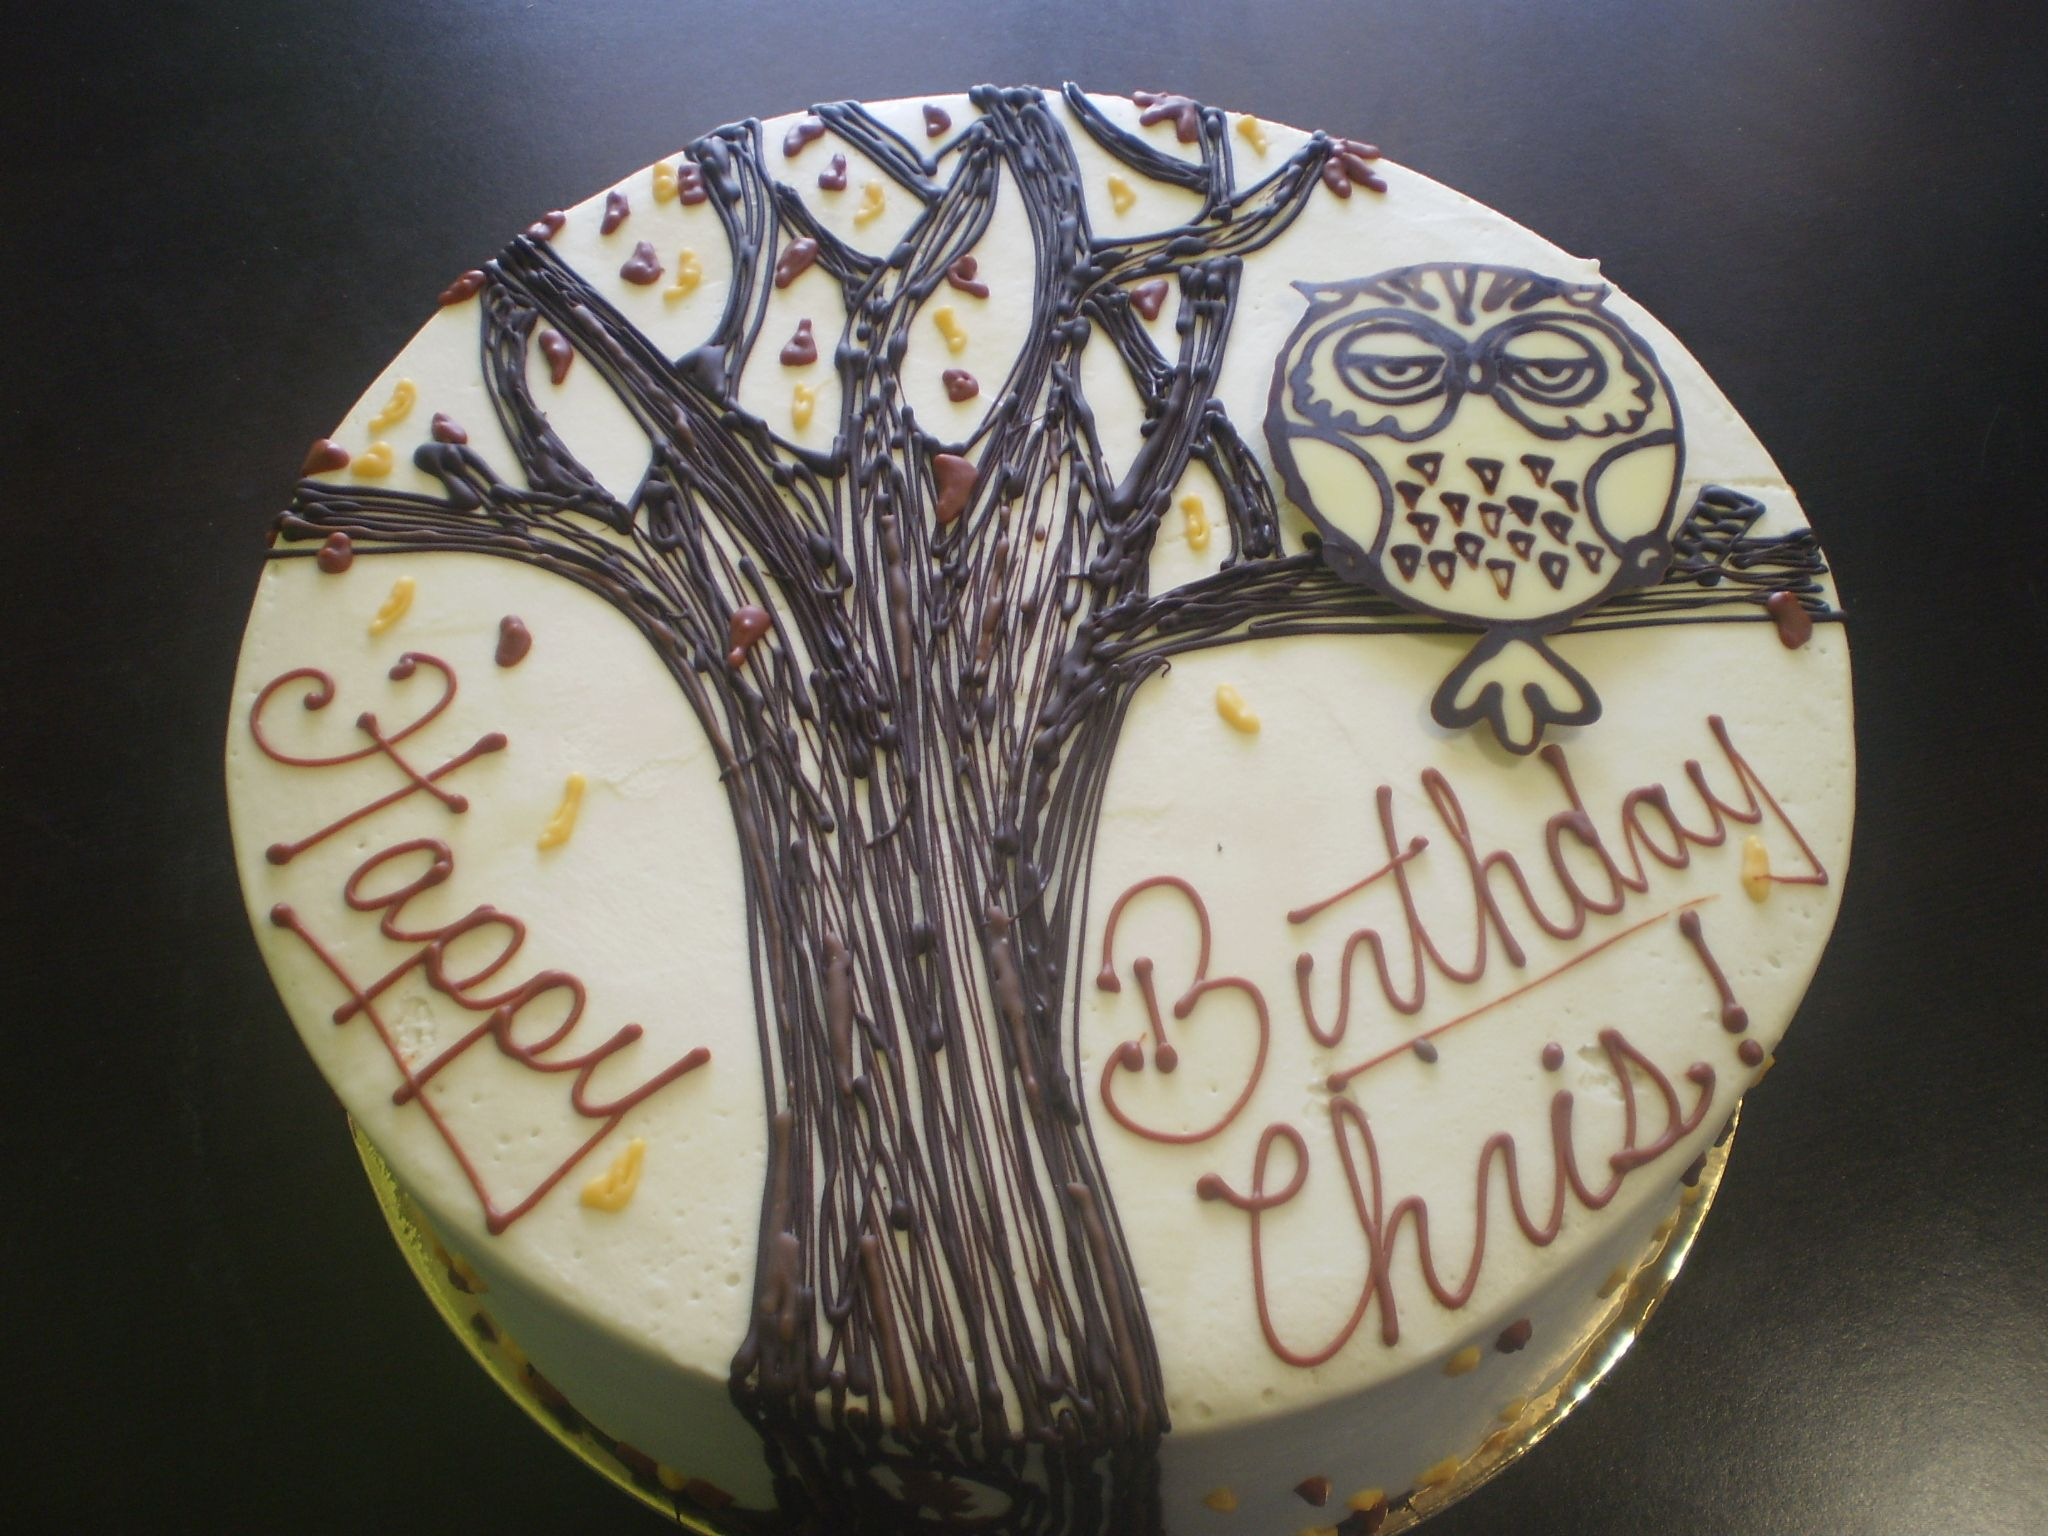 Cake flour birthday cake from cake flour an all natural